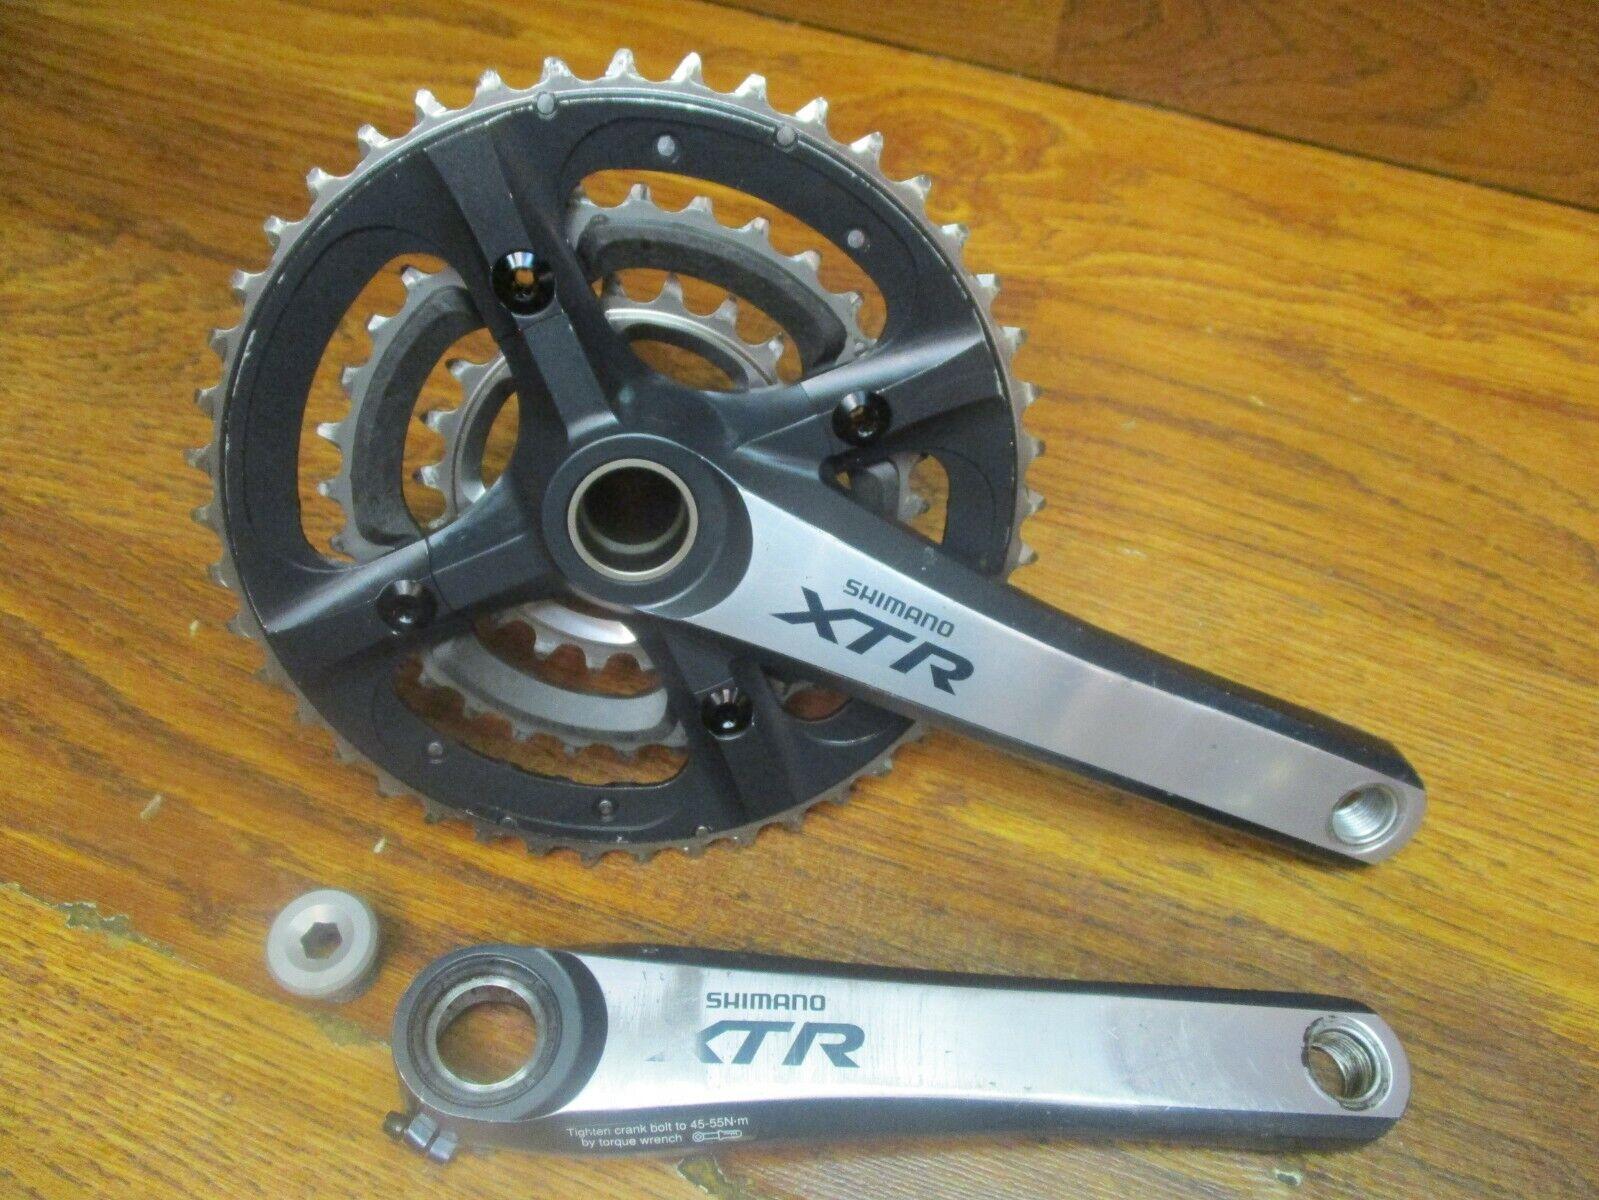 Stronglight Kettenblatt Set Shimano XTR FC-M970-44-32-22 Zähne 970 chain rings